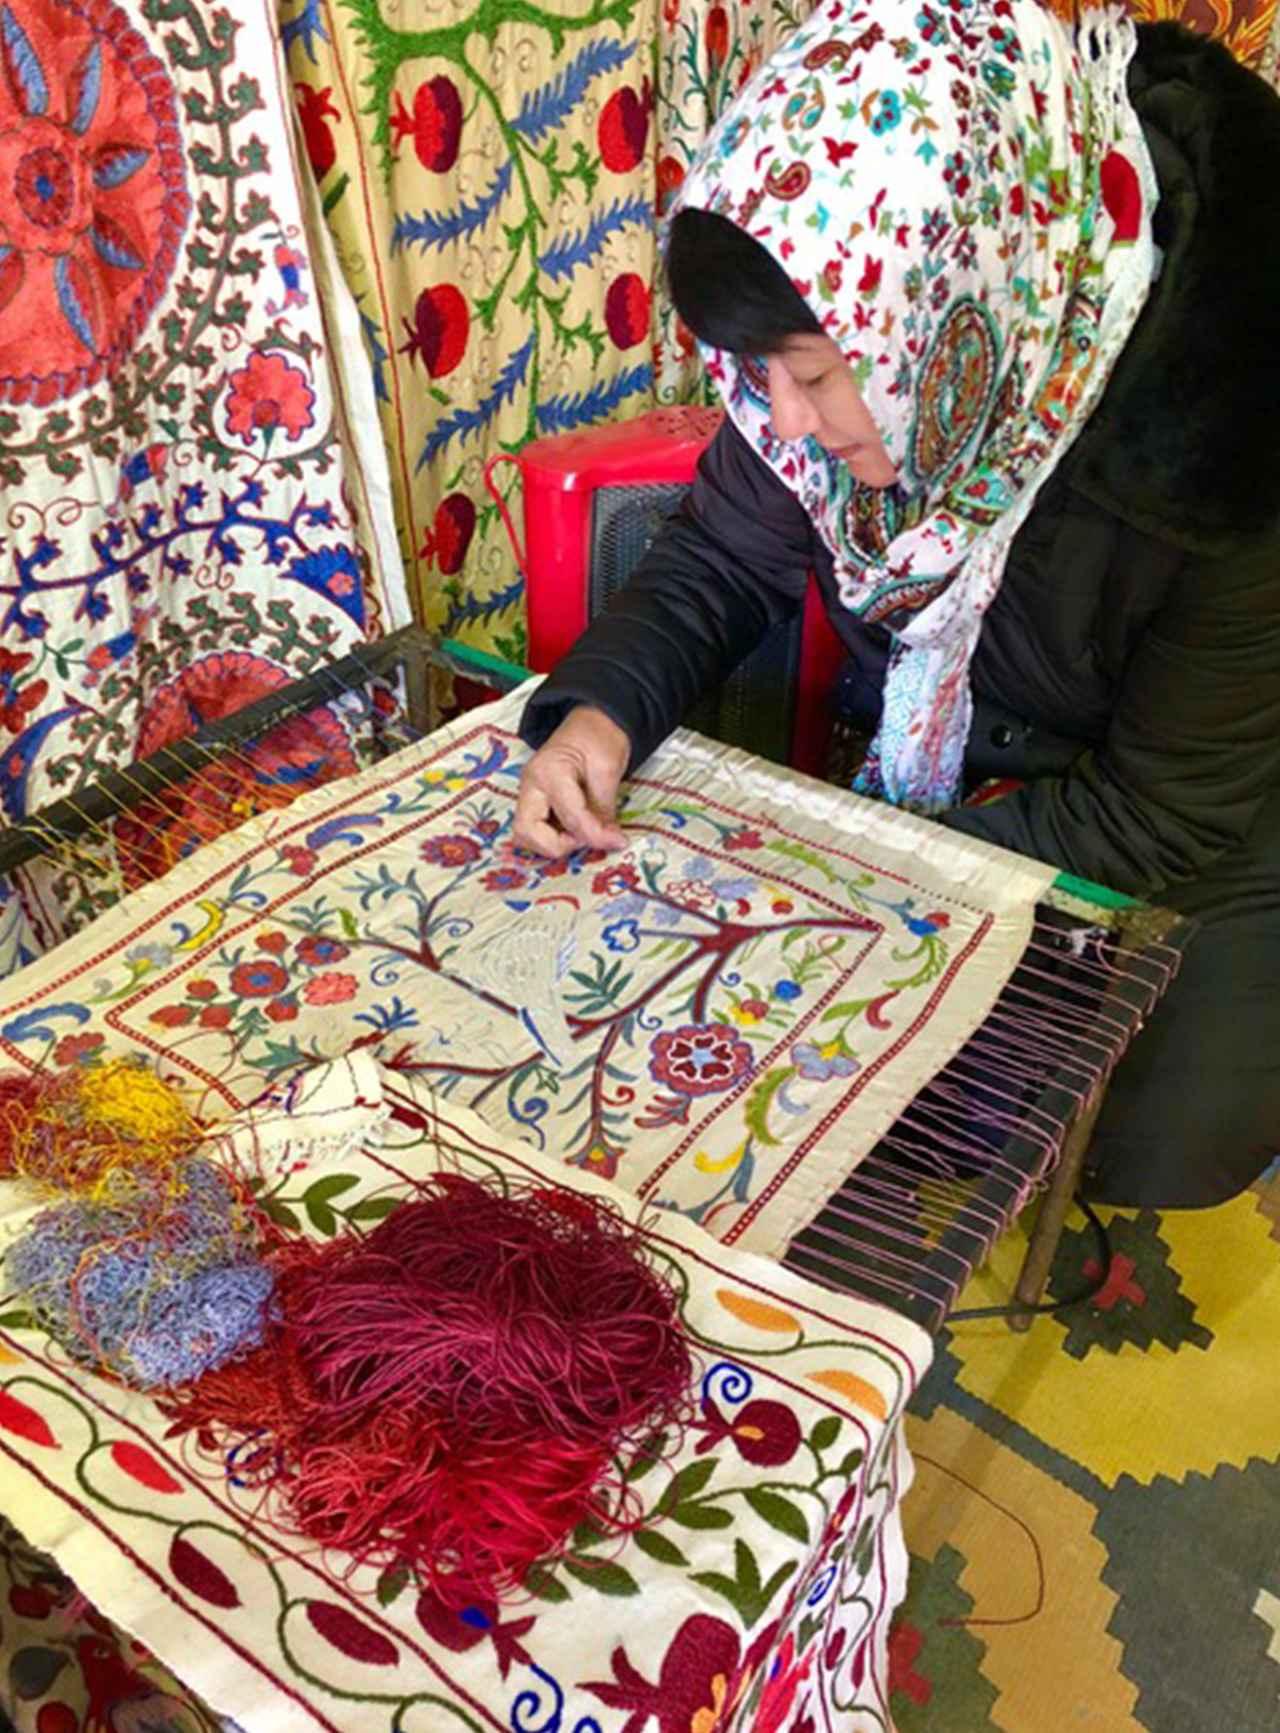 Images : 宮殿の外でスザニを売る女性